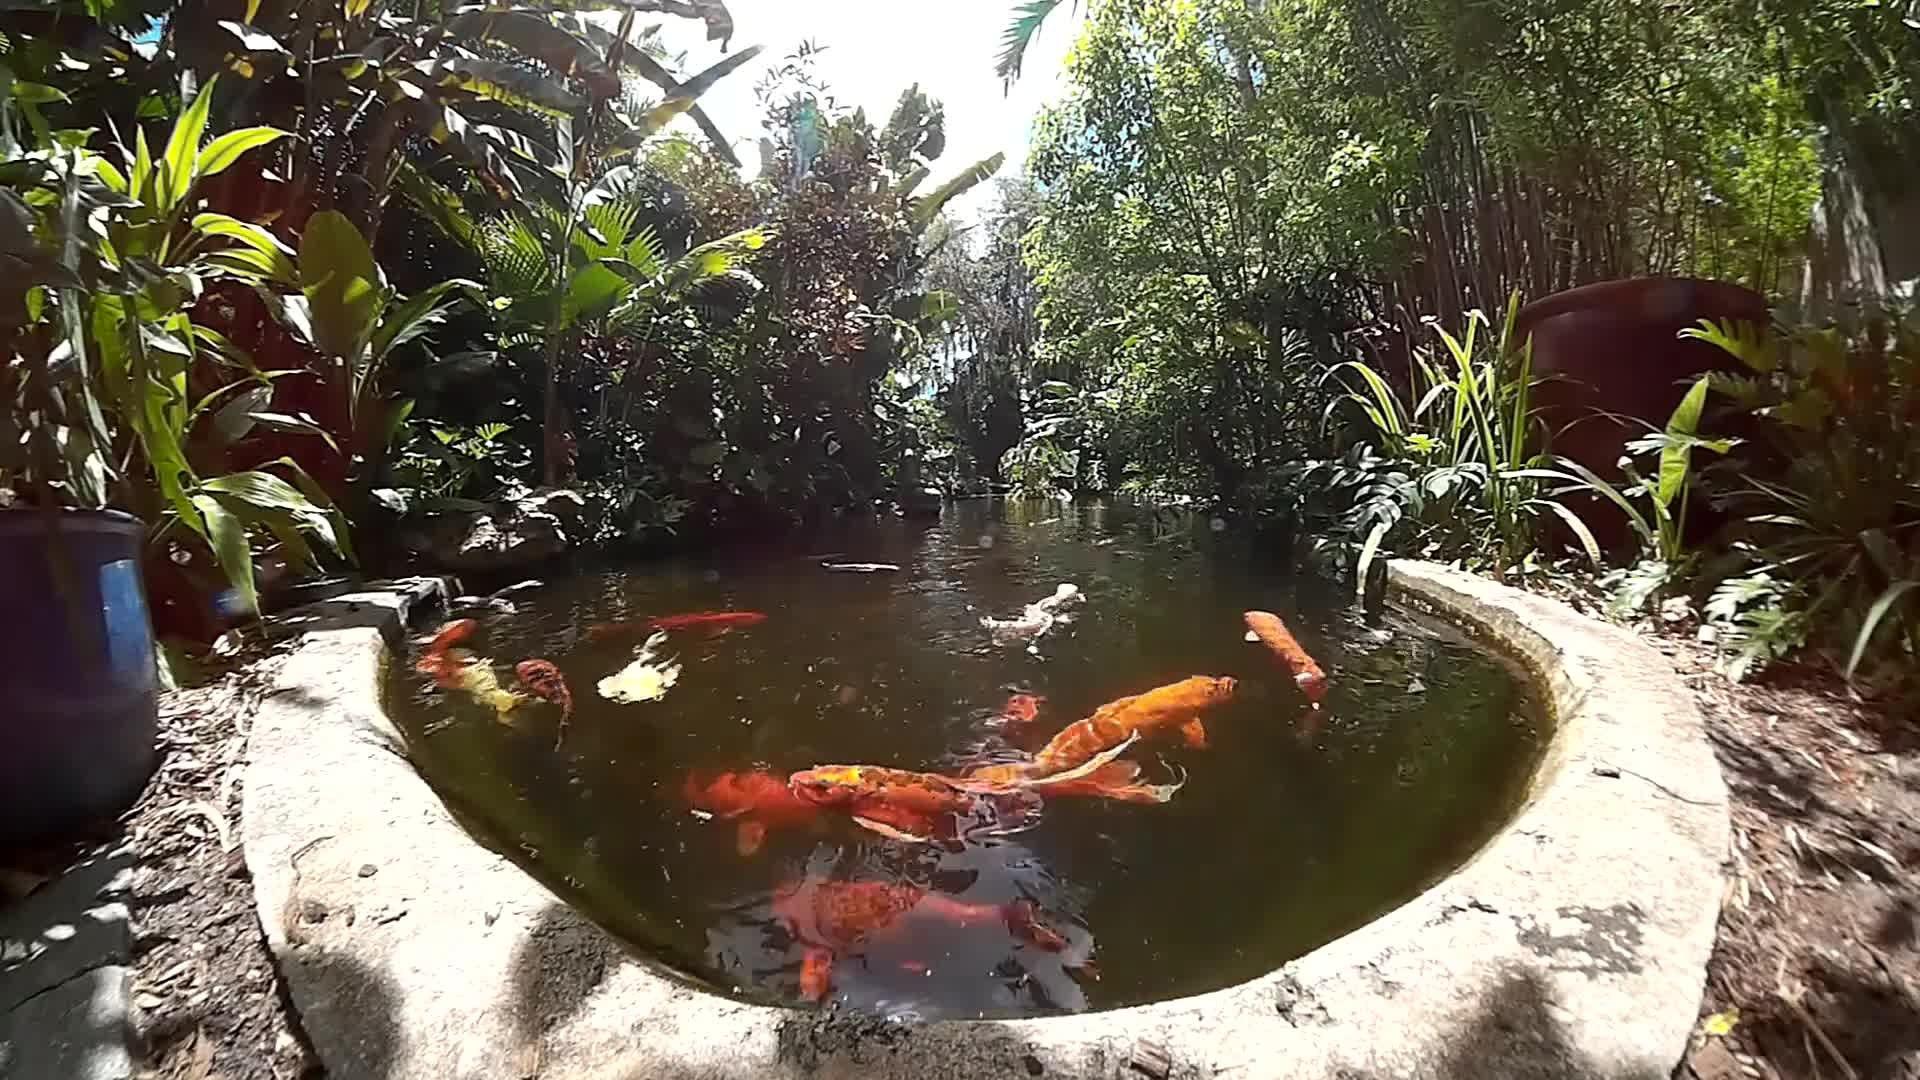 File:Koi - Marie Selby Botanical Gardens - Sarasota, Florida.webm ...